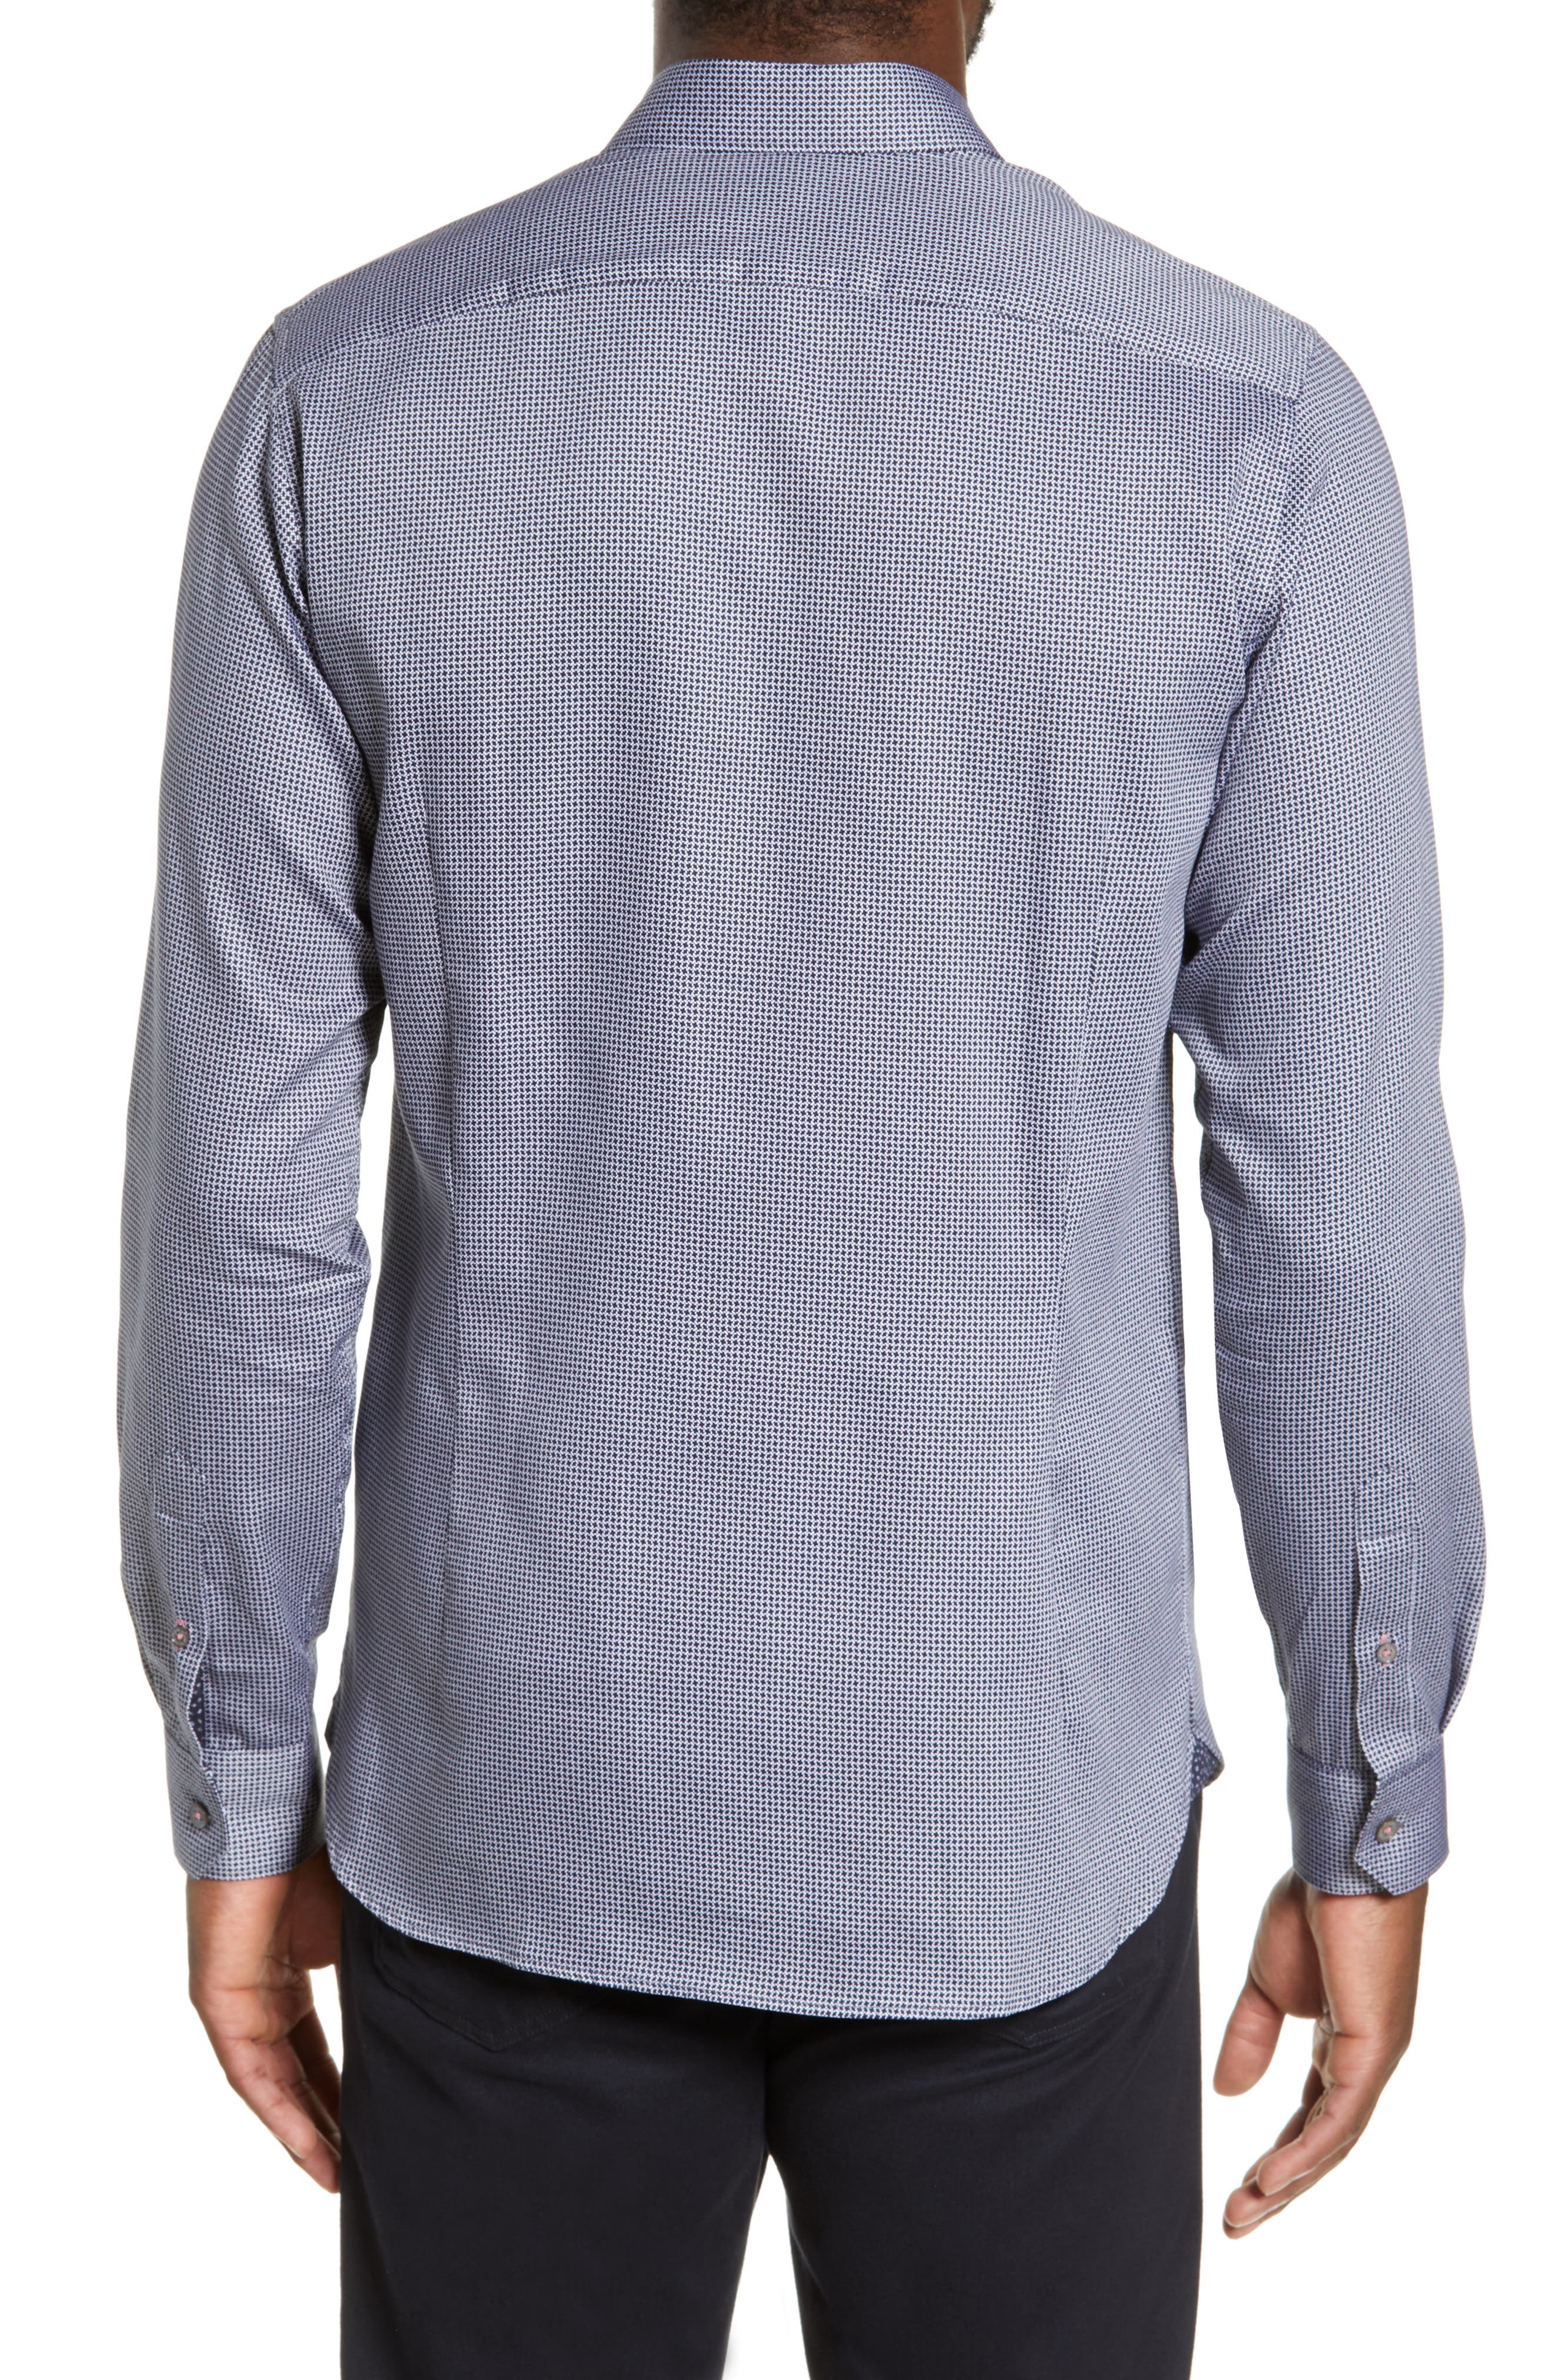 TED BAKER LONDON, Bloosem Slim Fit Print Sport Shirt, Alternate thumbnail 3, color, NAVY